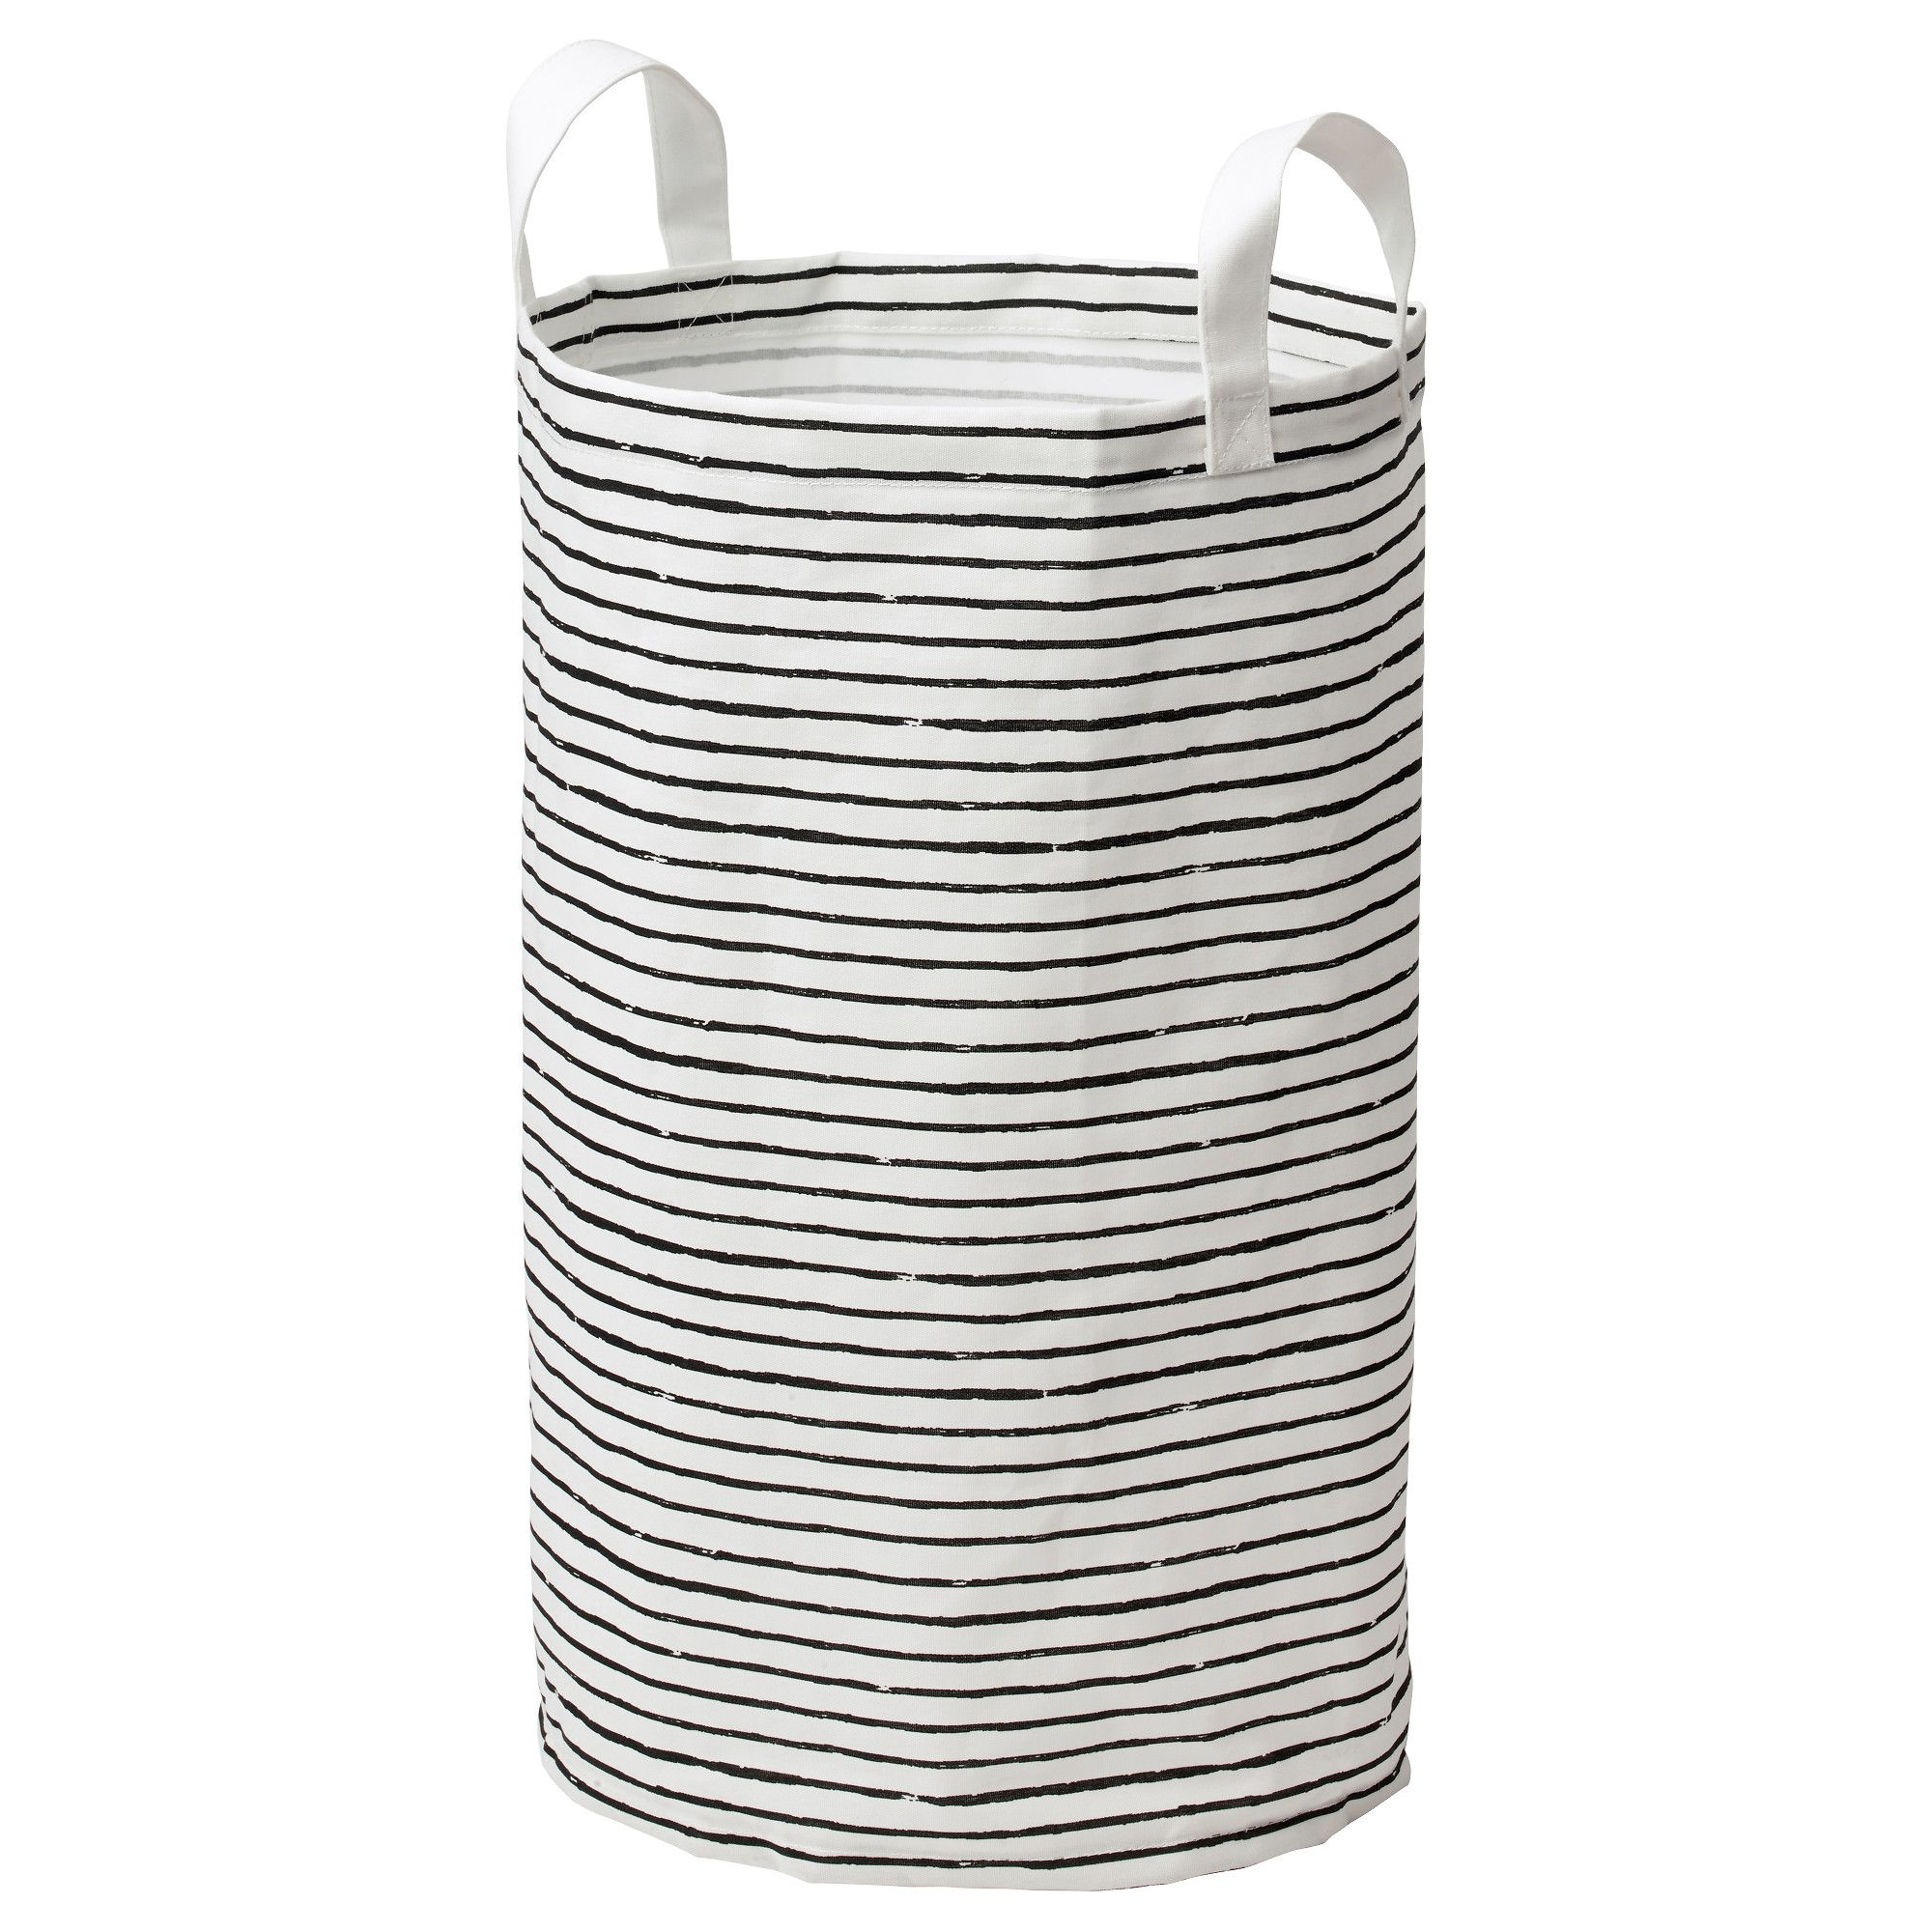 Klunka Laundry Bag White Black 16 Gallon Ikea Laundry Ikea